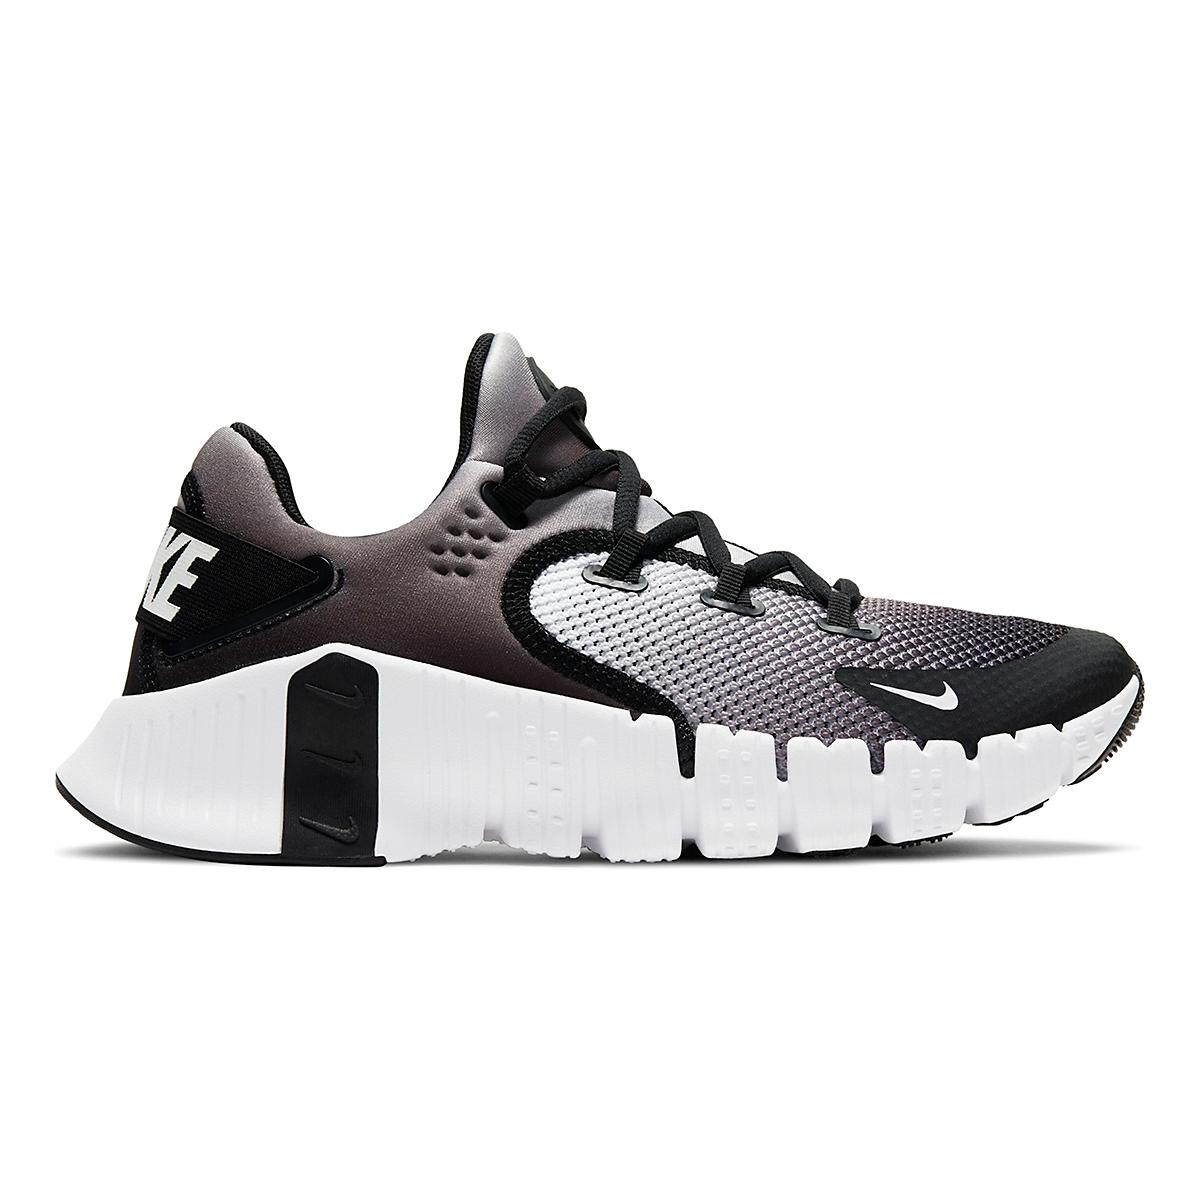 Women's Nike Free Metcon 4 Training Shoe - Color: White/Black - Size: 5 - Width: Regular, White/Black, large, image 1